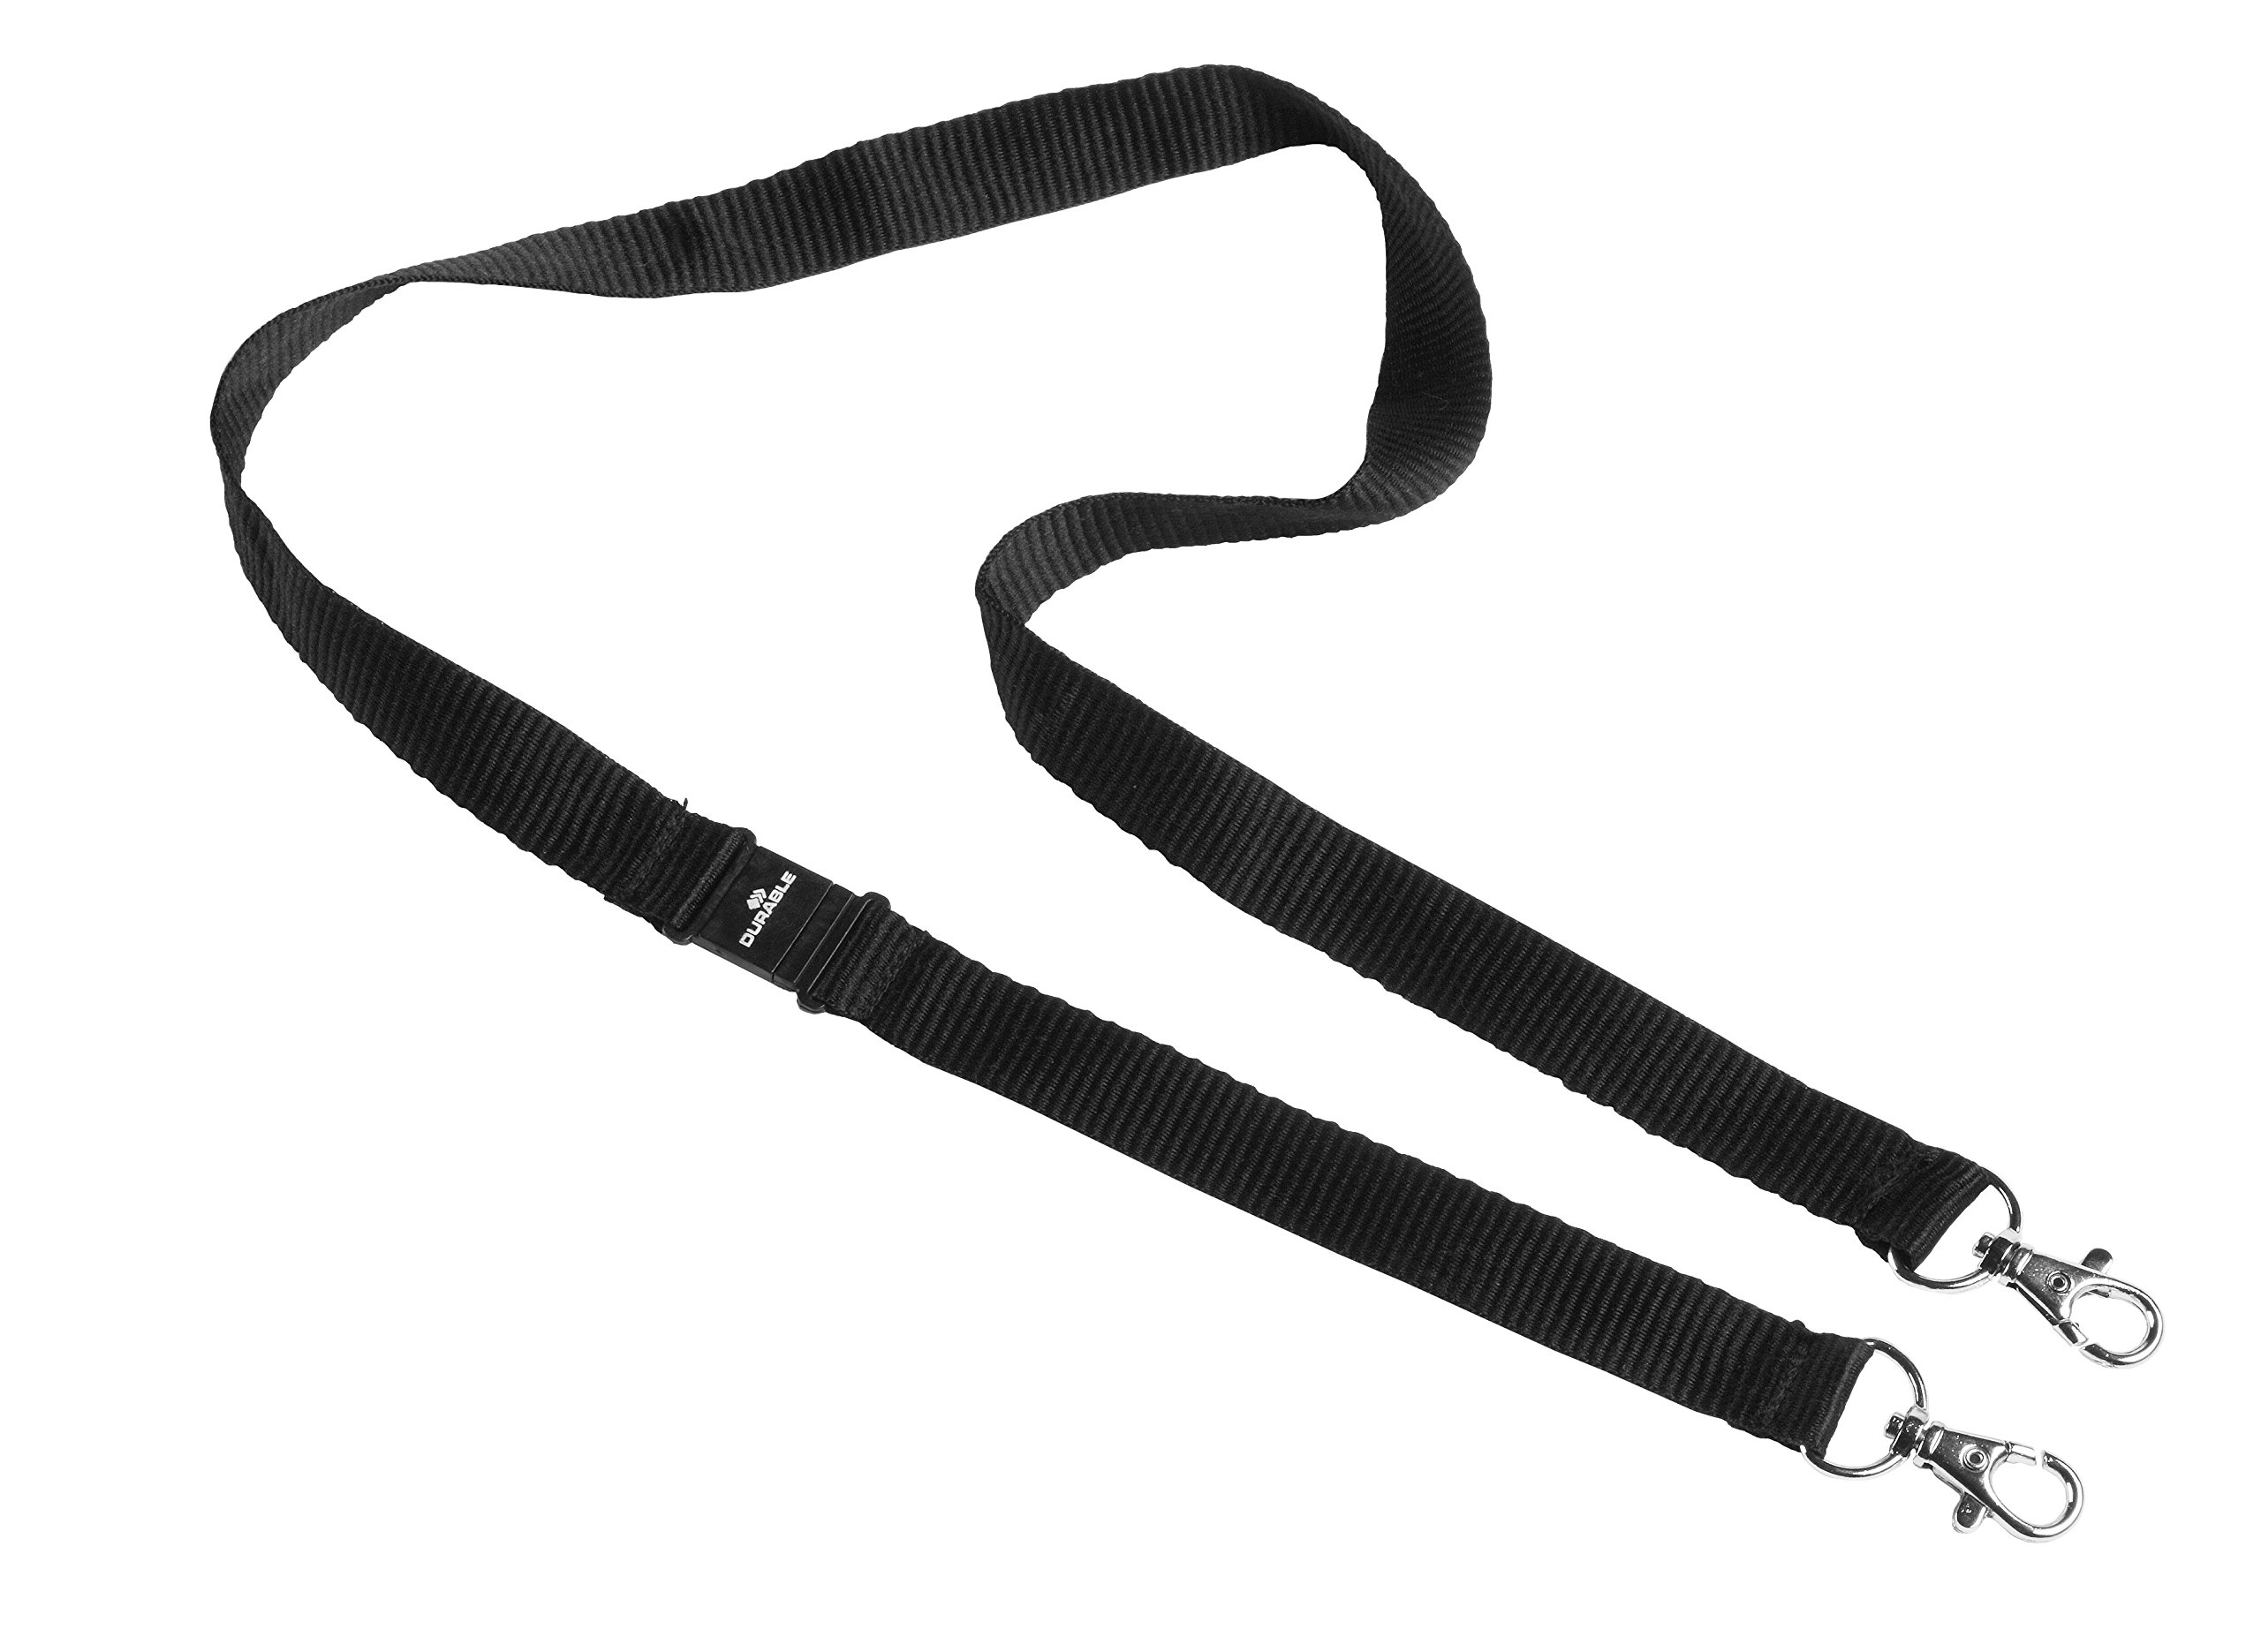 Durable 852701 Textile Tape Duo, 10 pcs, Black by Durable (Image #1)